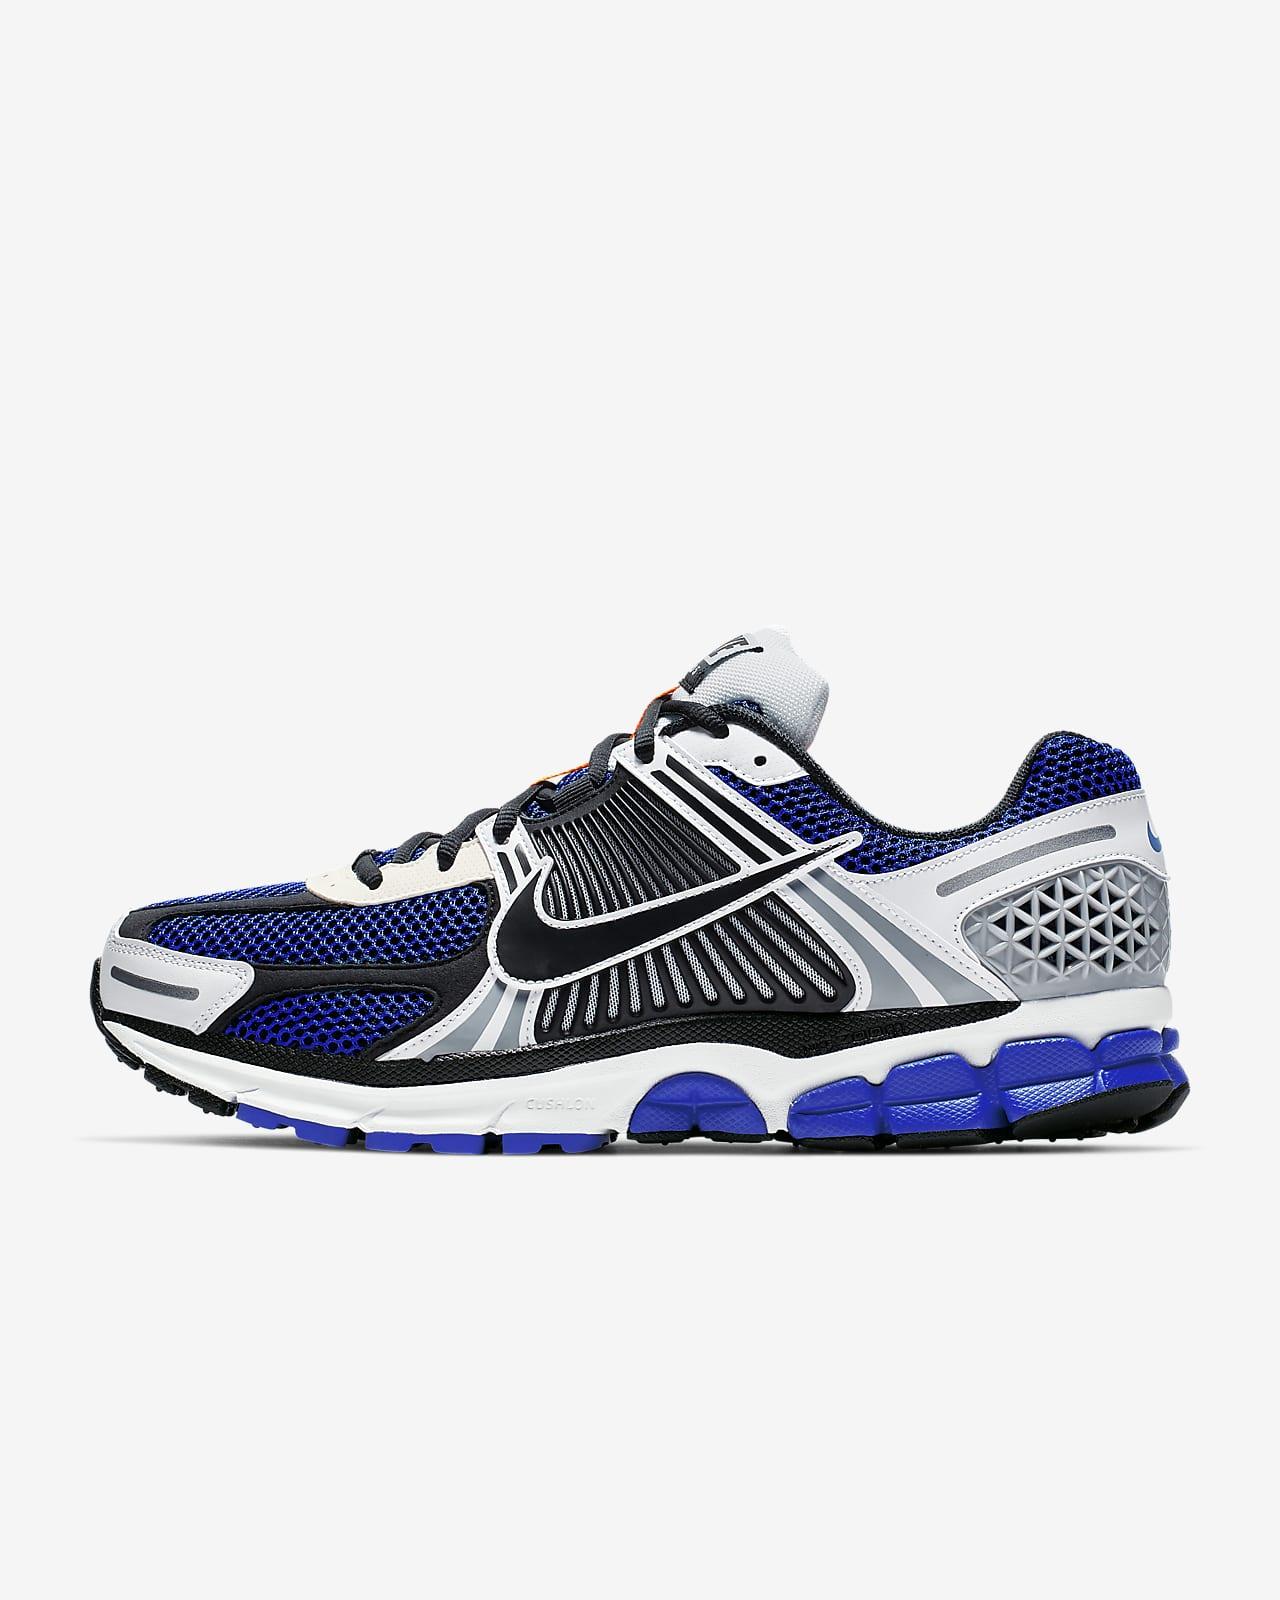 Nike Zoom Vomero 5 SE SP Men's Shoe